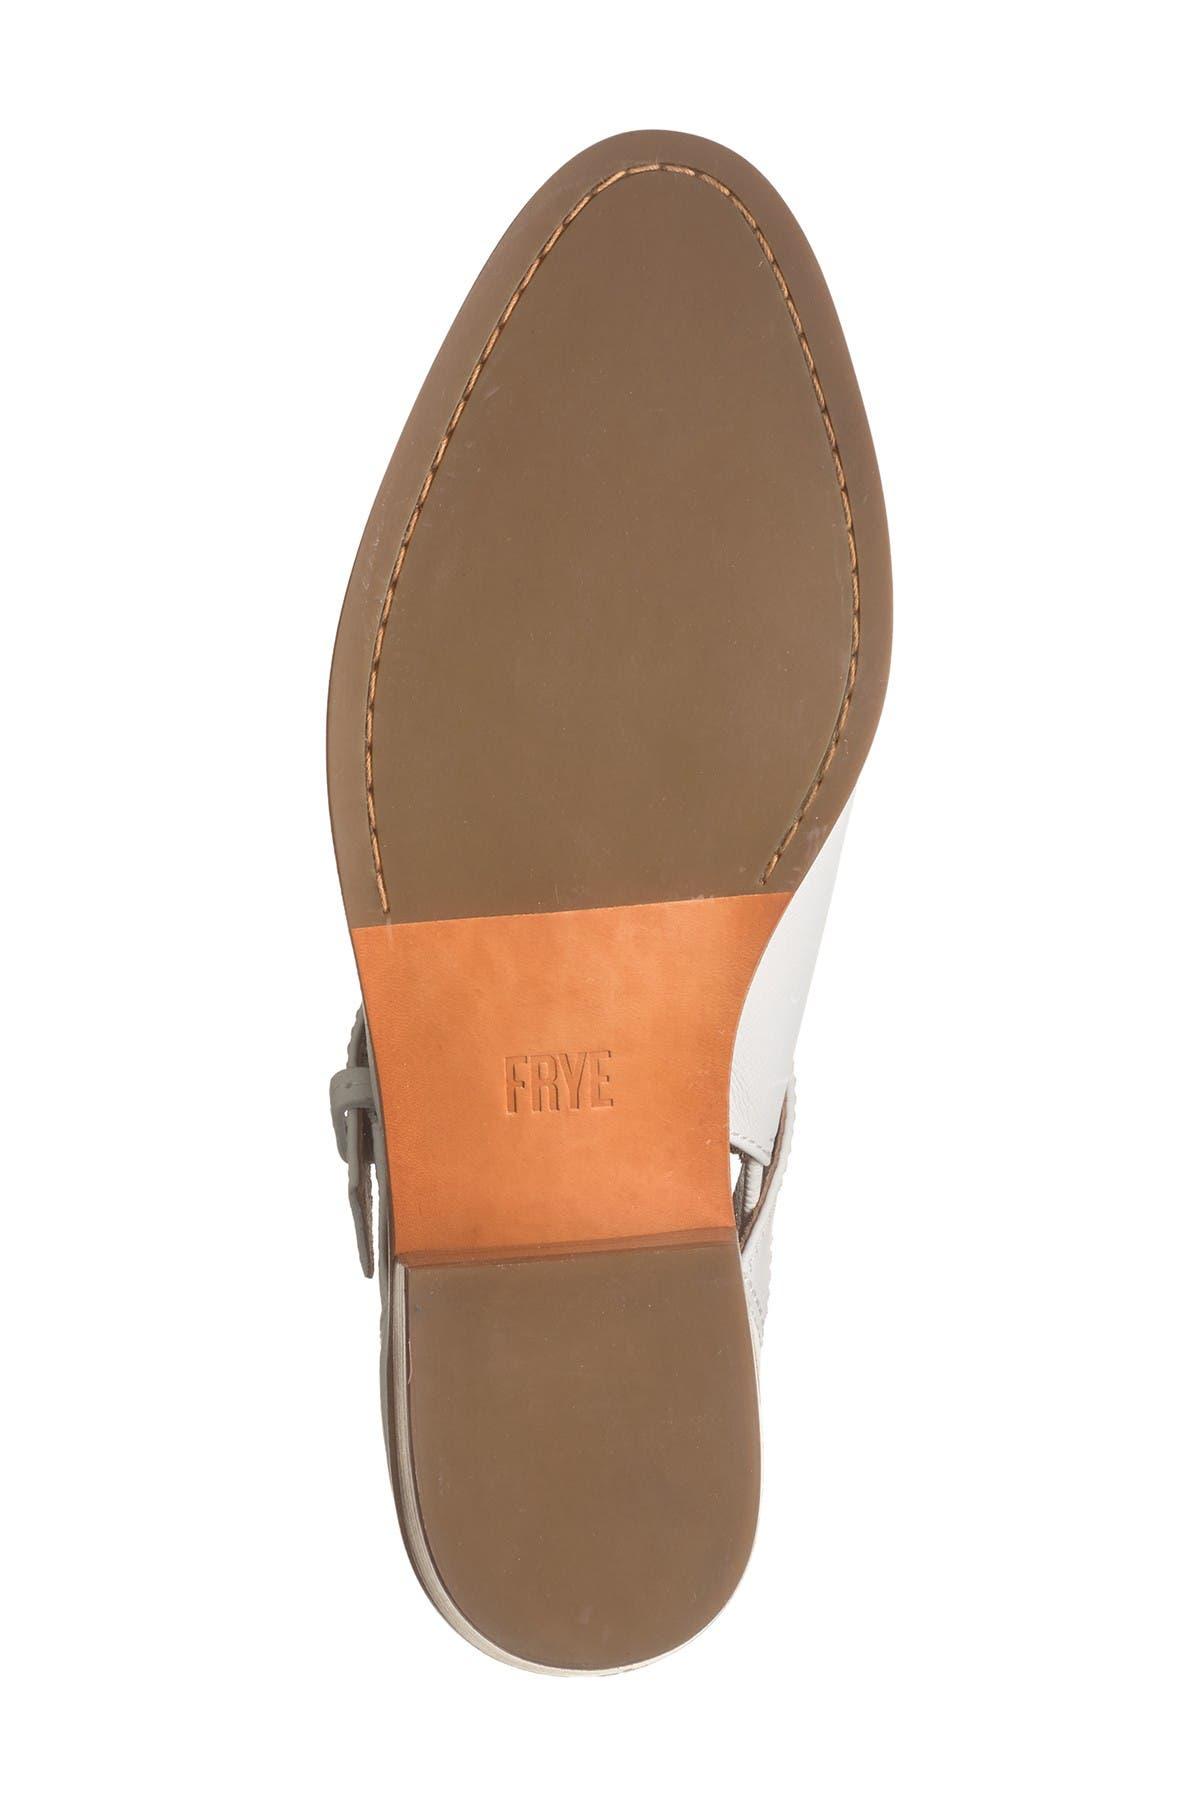 Frye Mia Cutout Leather Bootie